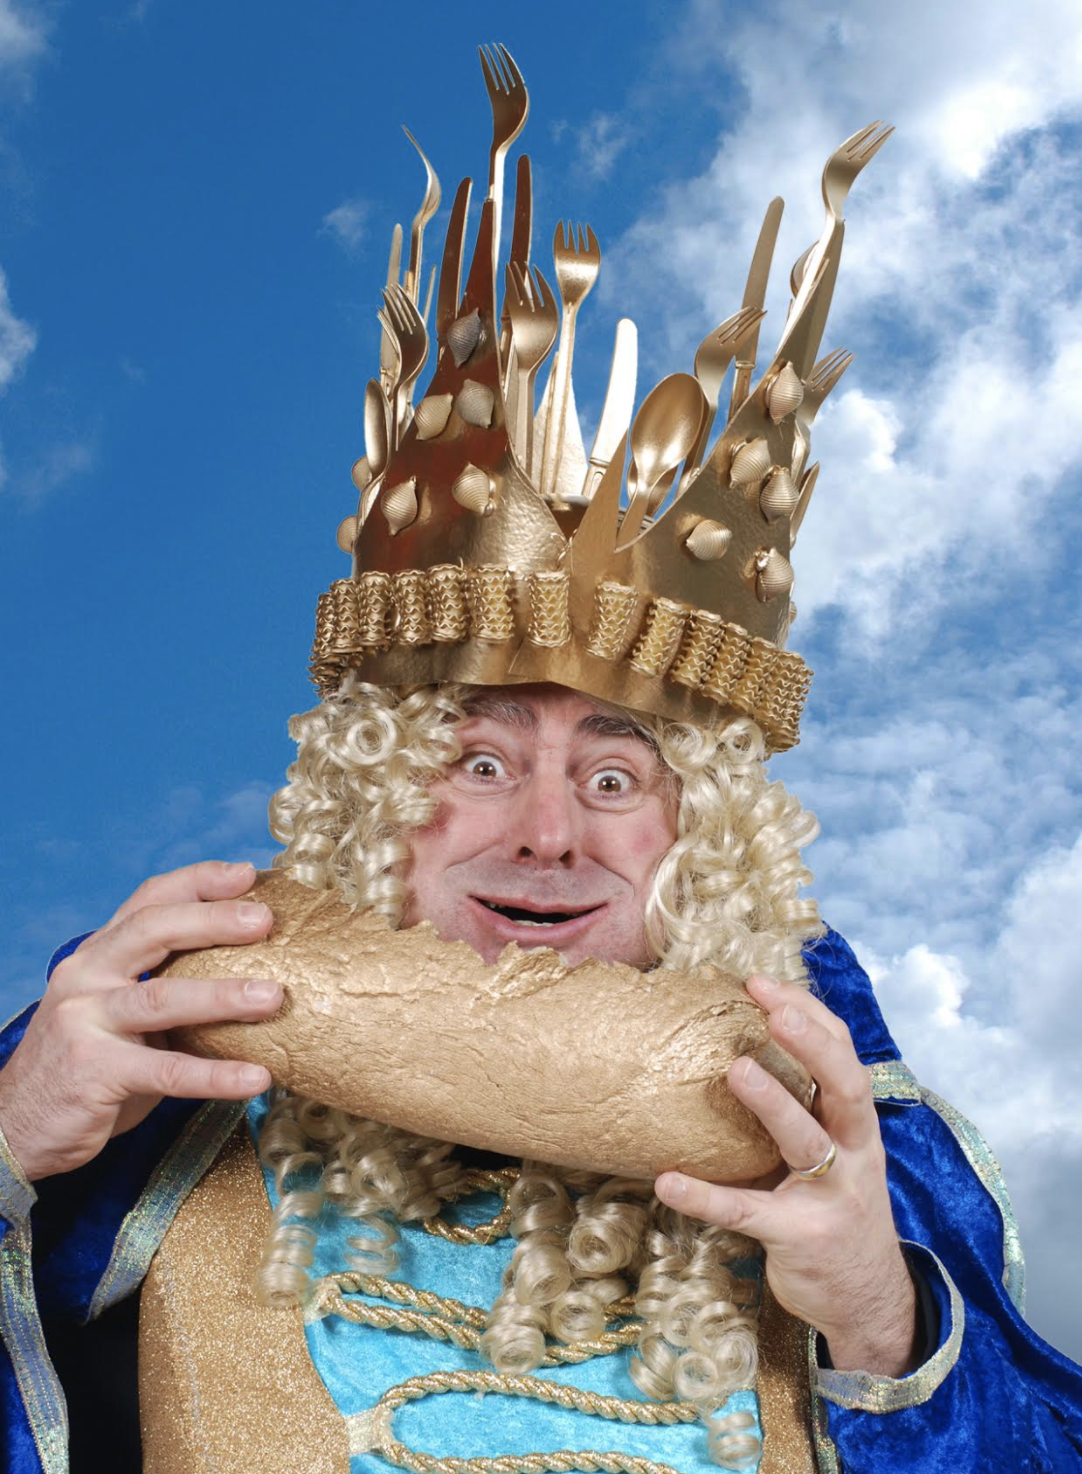 König Nimmersatt - Kaspertheater, Kinder, Spass, Unterhaltung, Comedy